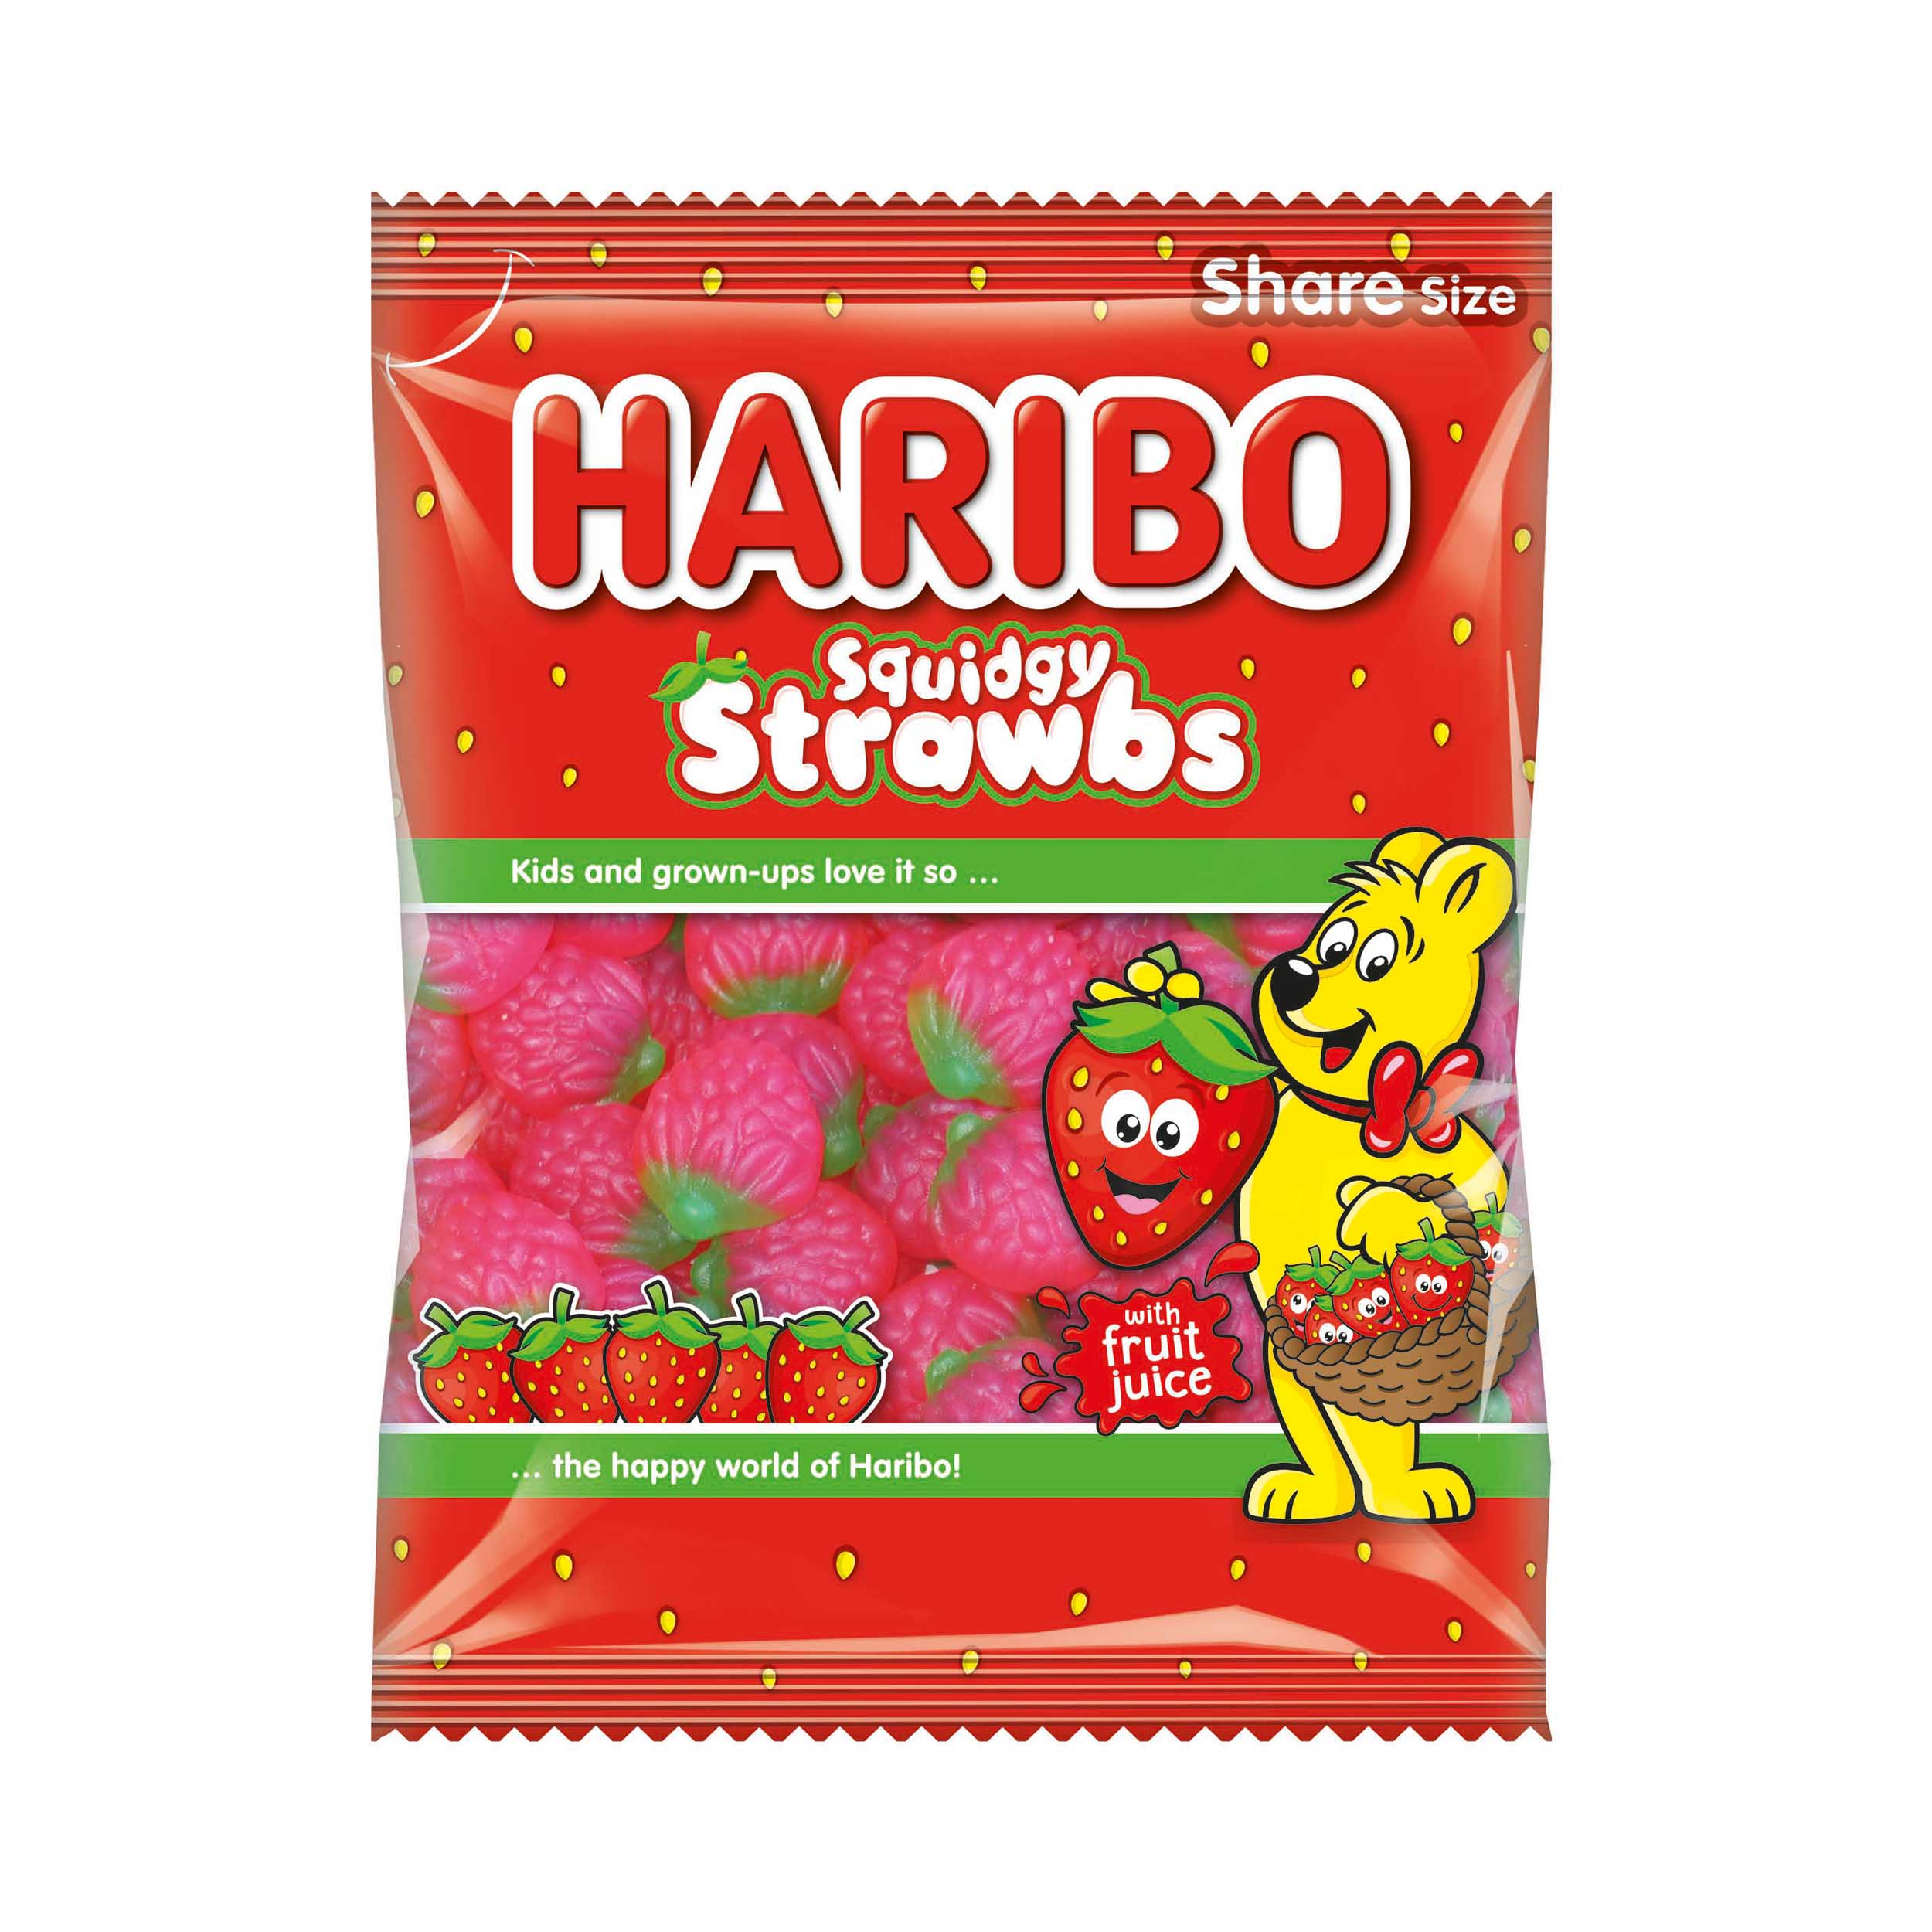 PG Tips Tea Bags Pyramid Ref 67395657 [Pk 440] [Buy 2 Get Free Haribo Giant Strawbs Bag 180g] Jan-Mar 20